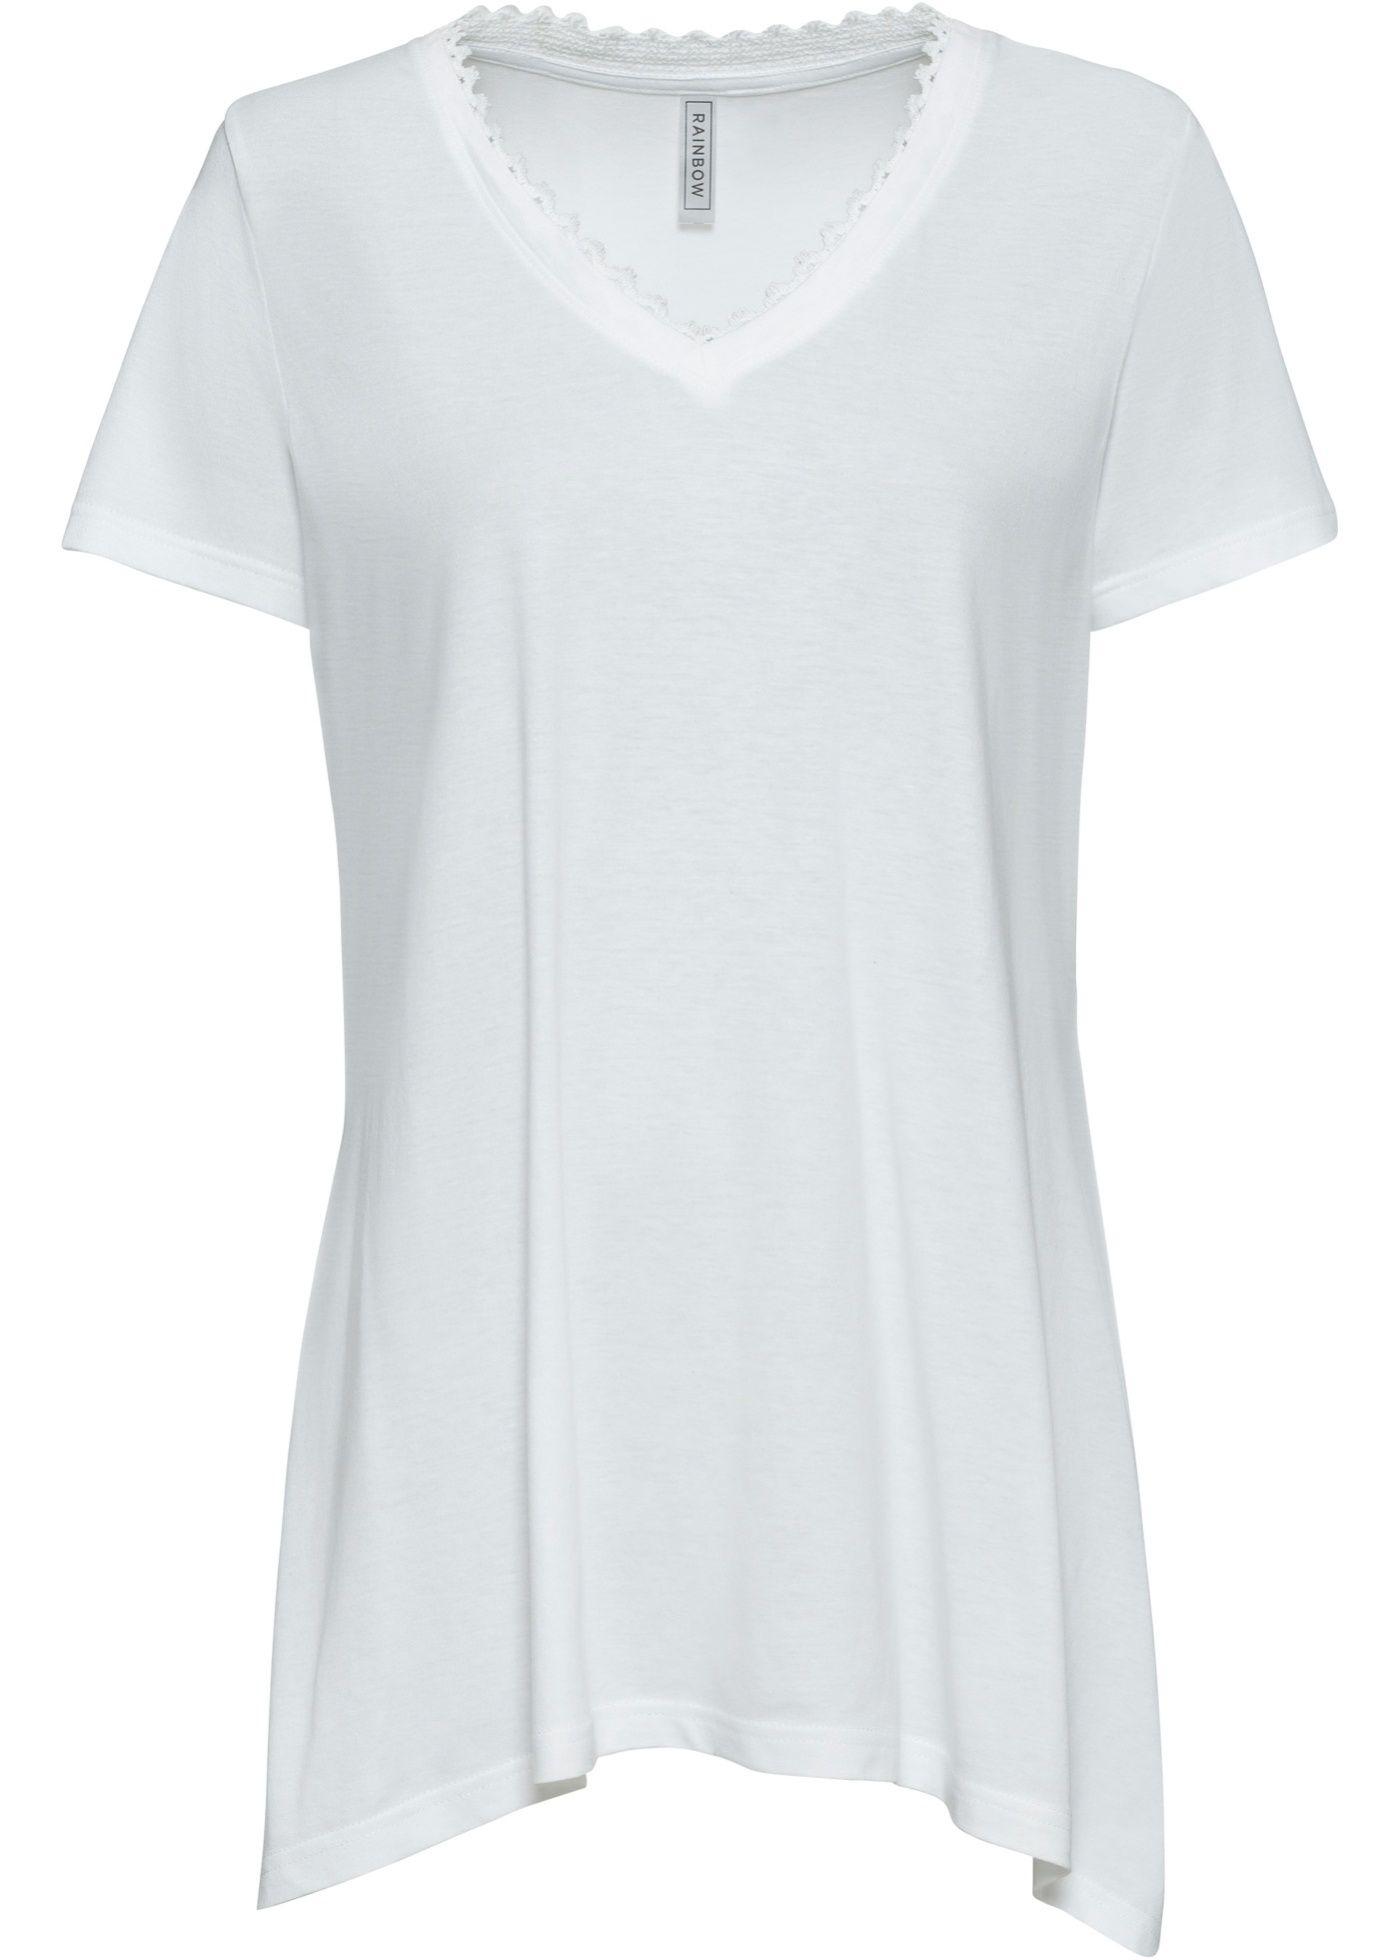 Photo of T-Shirt mit Zipfel-Saum